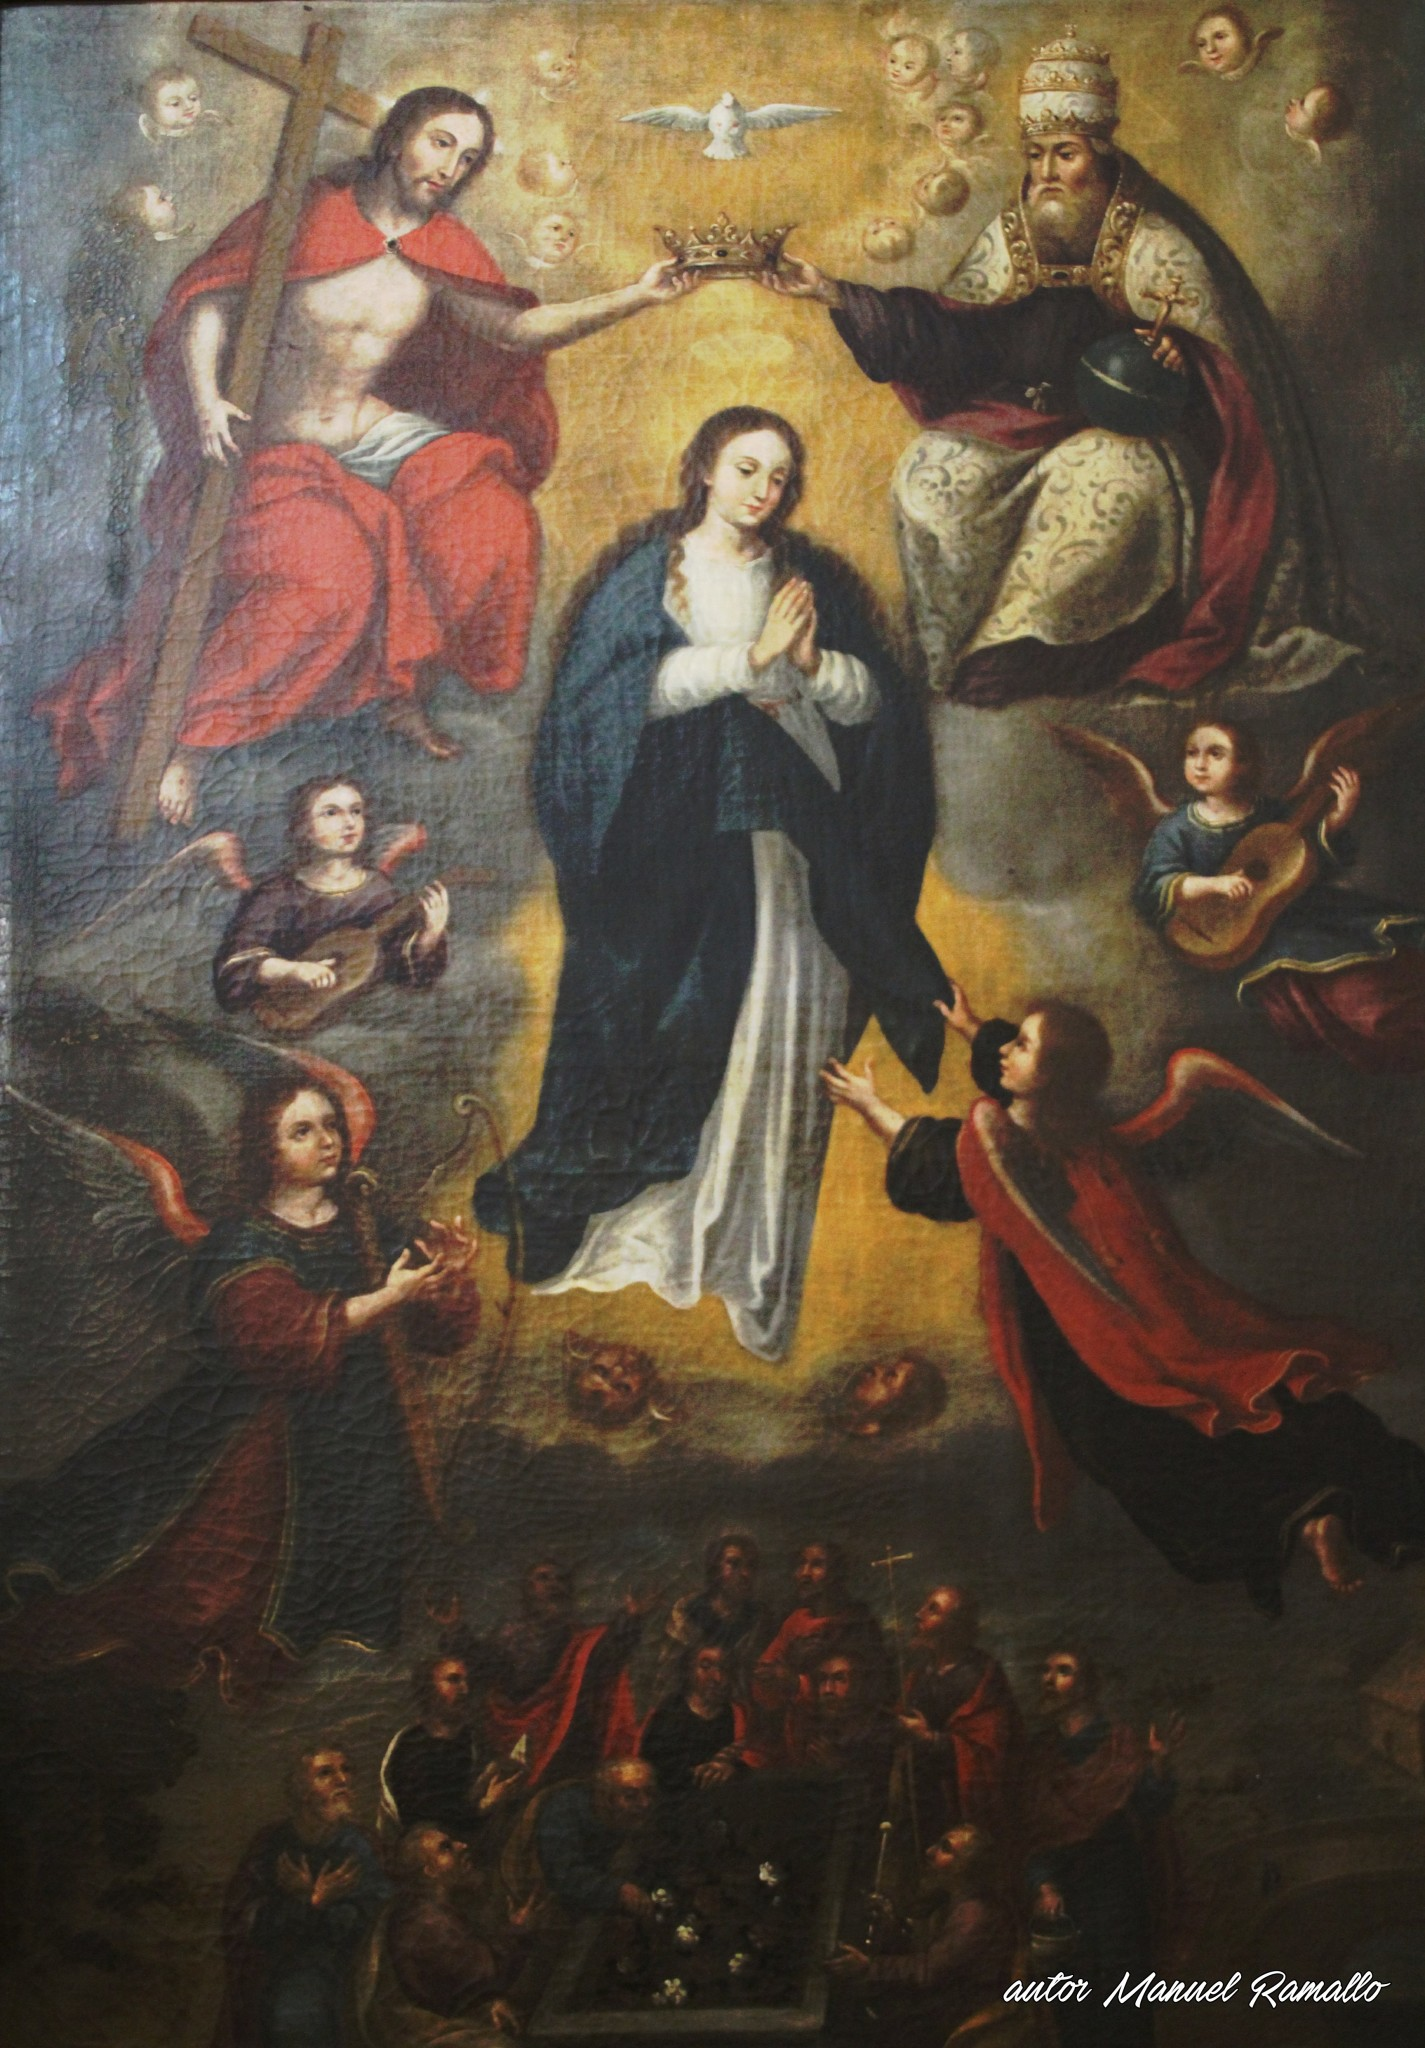 Pintura de la Ascensión de la Virgen catedral de Jerez Cádiz autor Manuel Ramallo